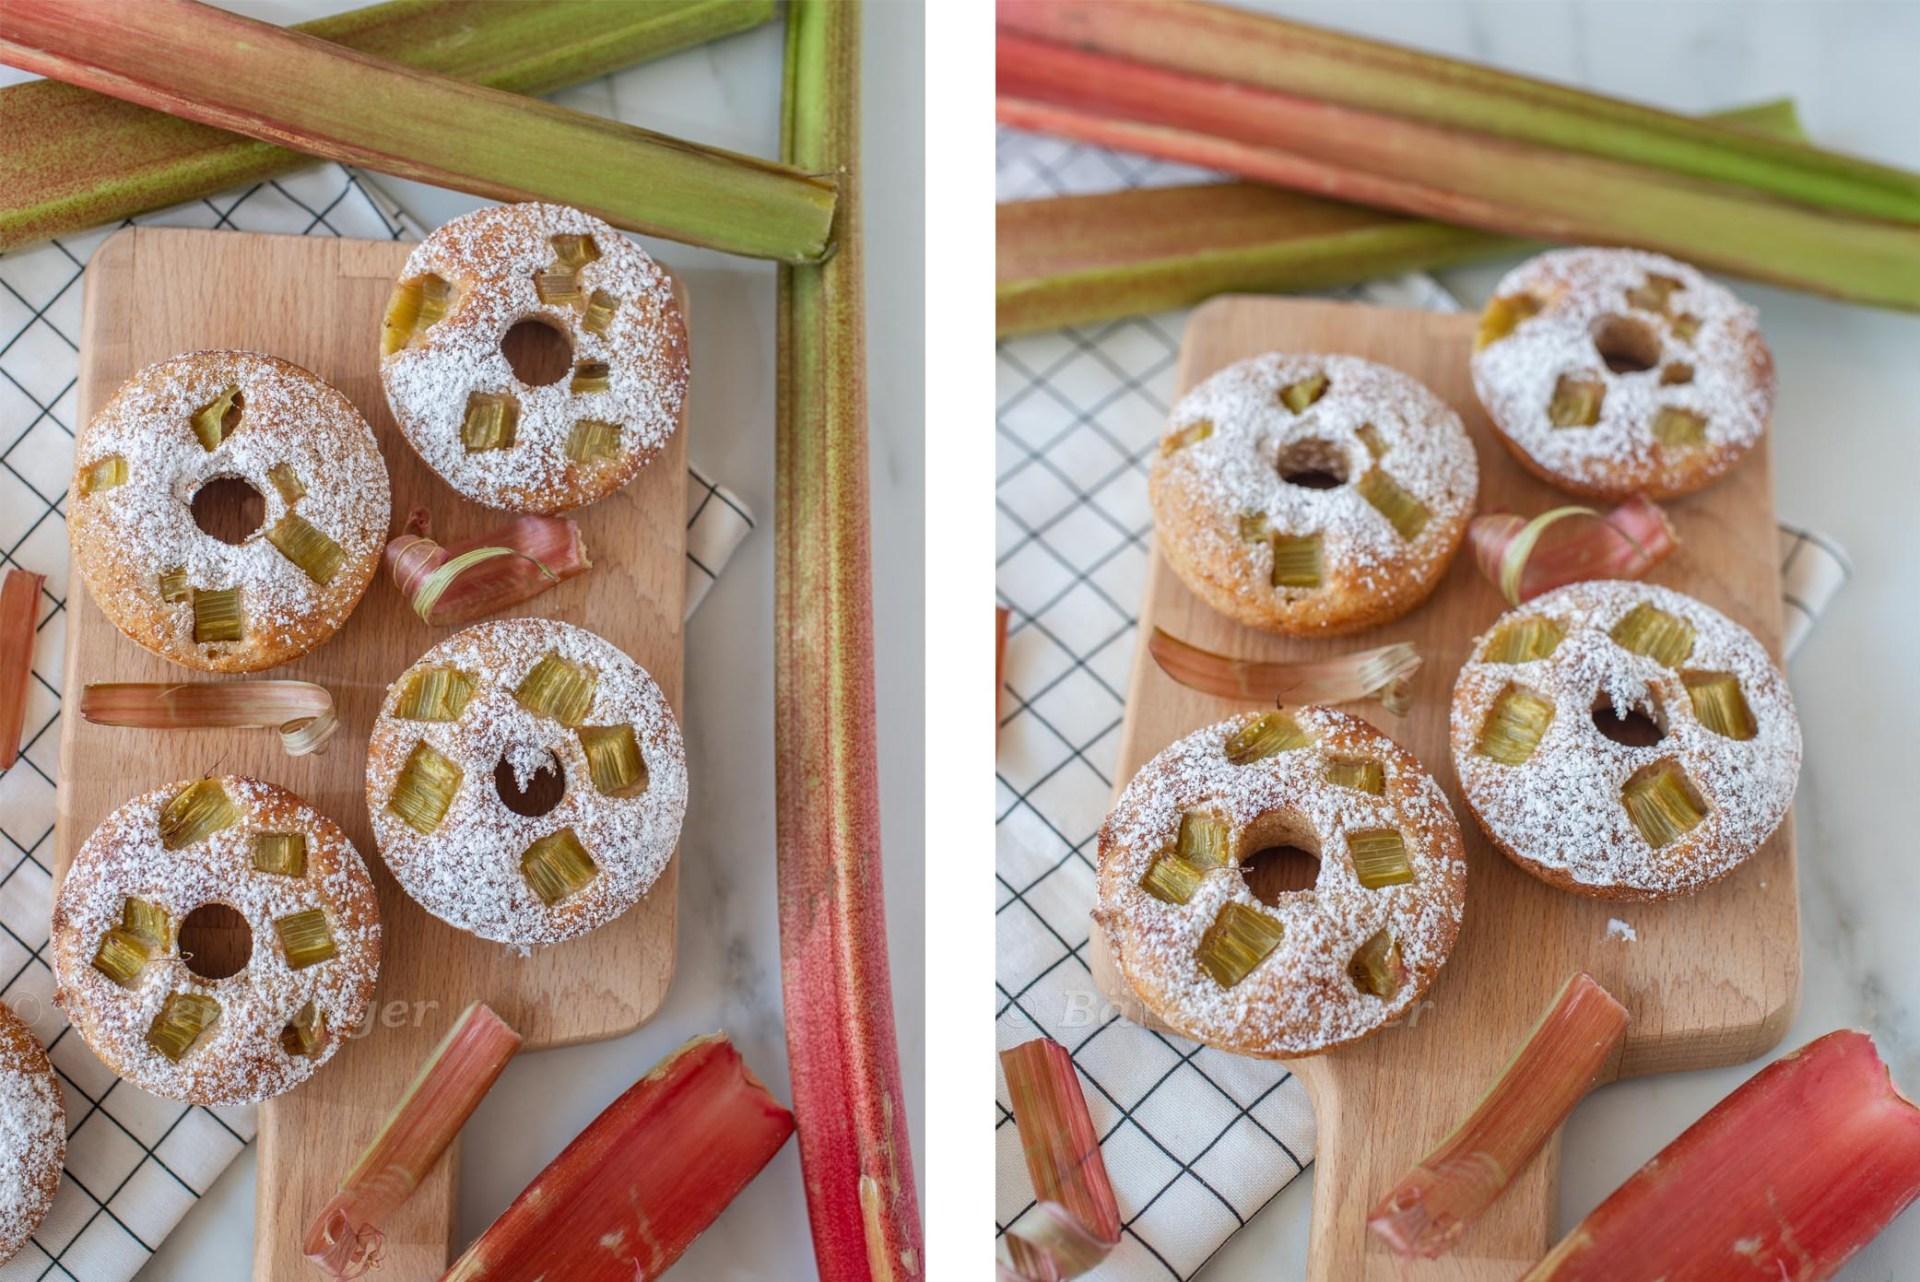 Rhabarber Vanille Donuts